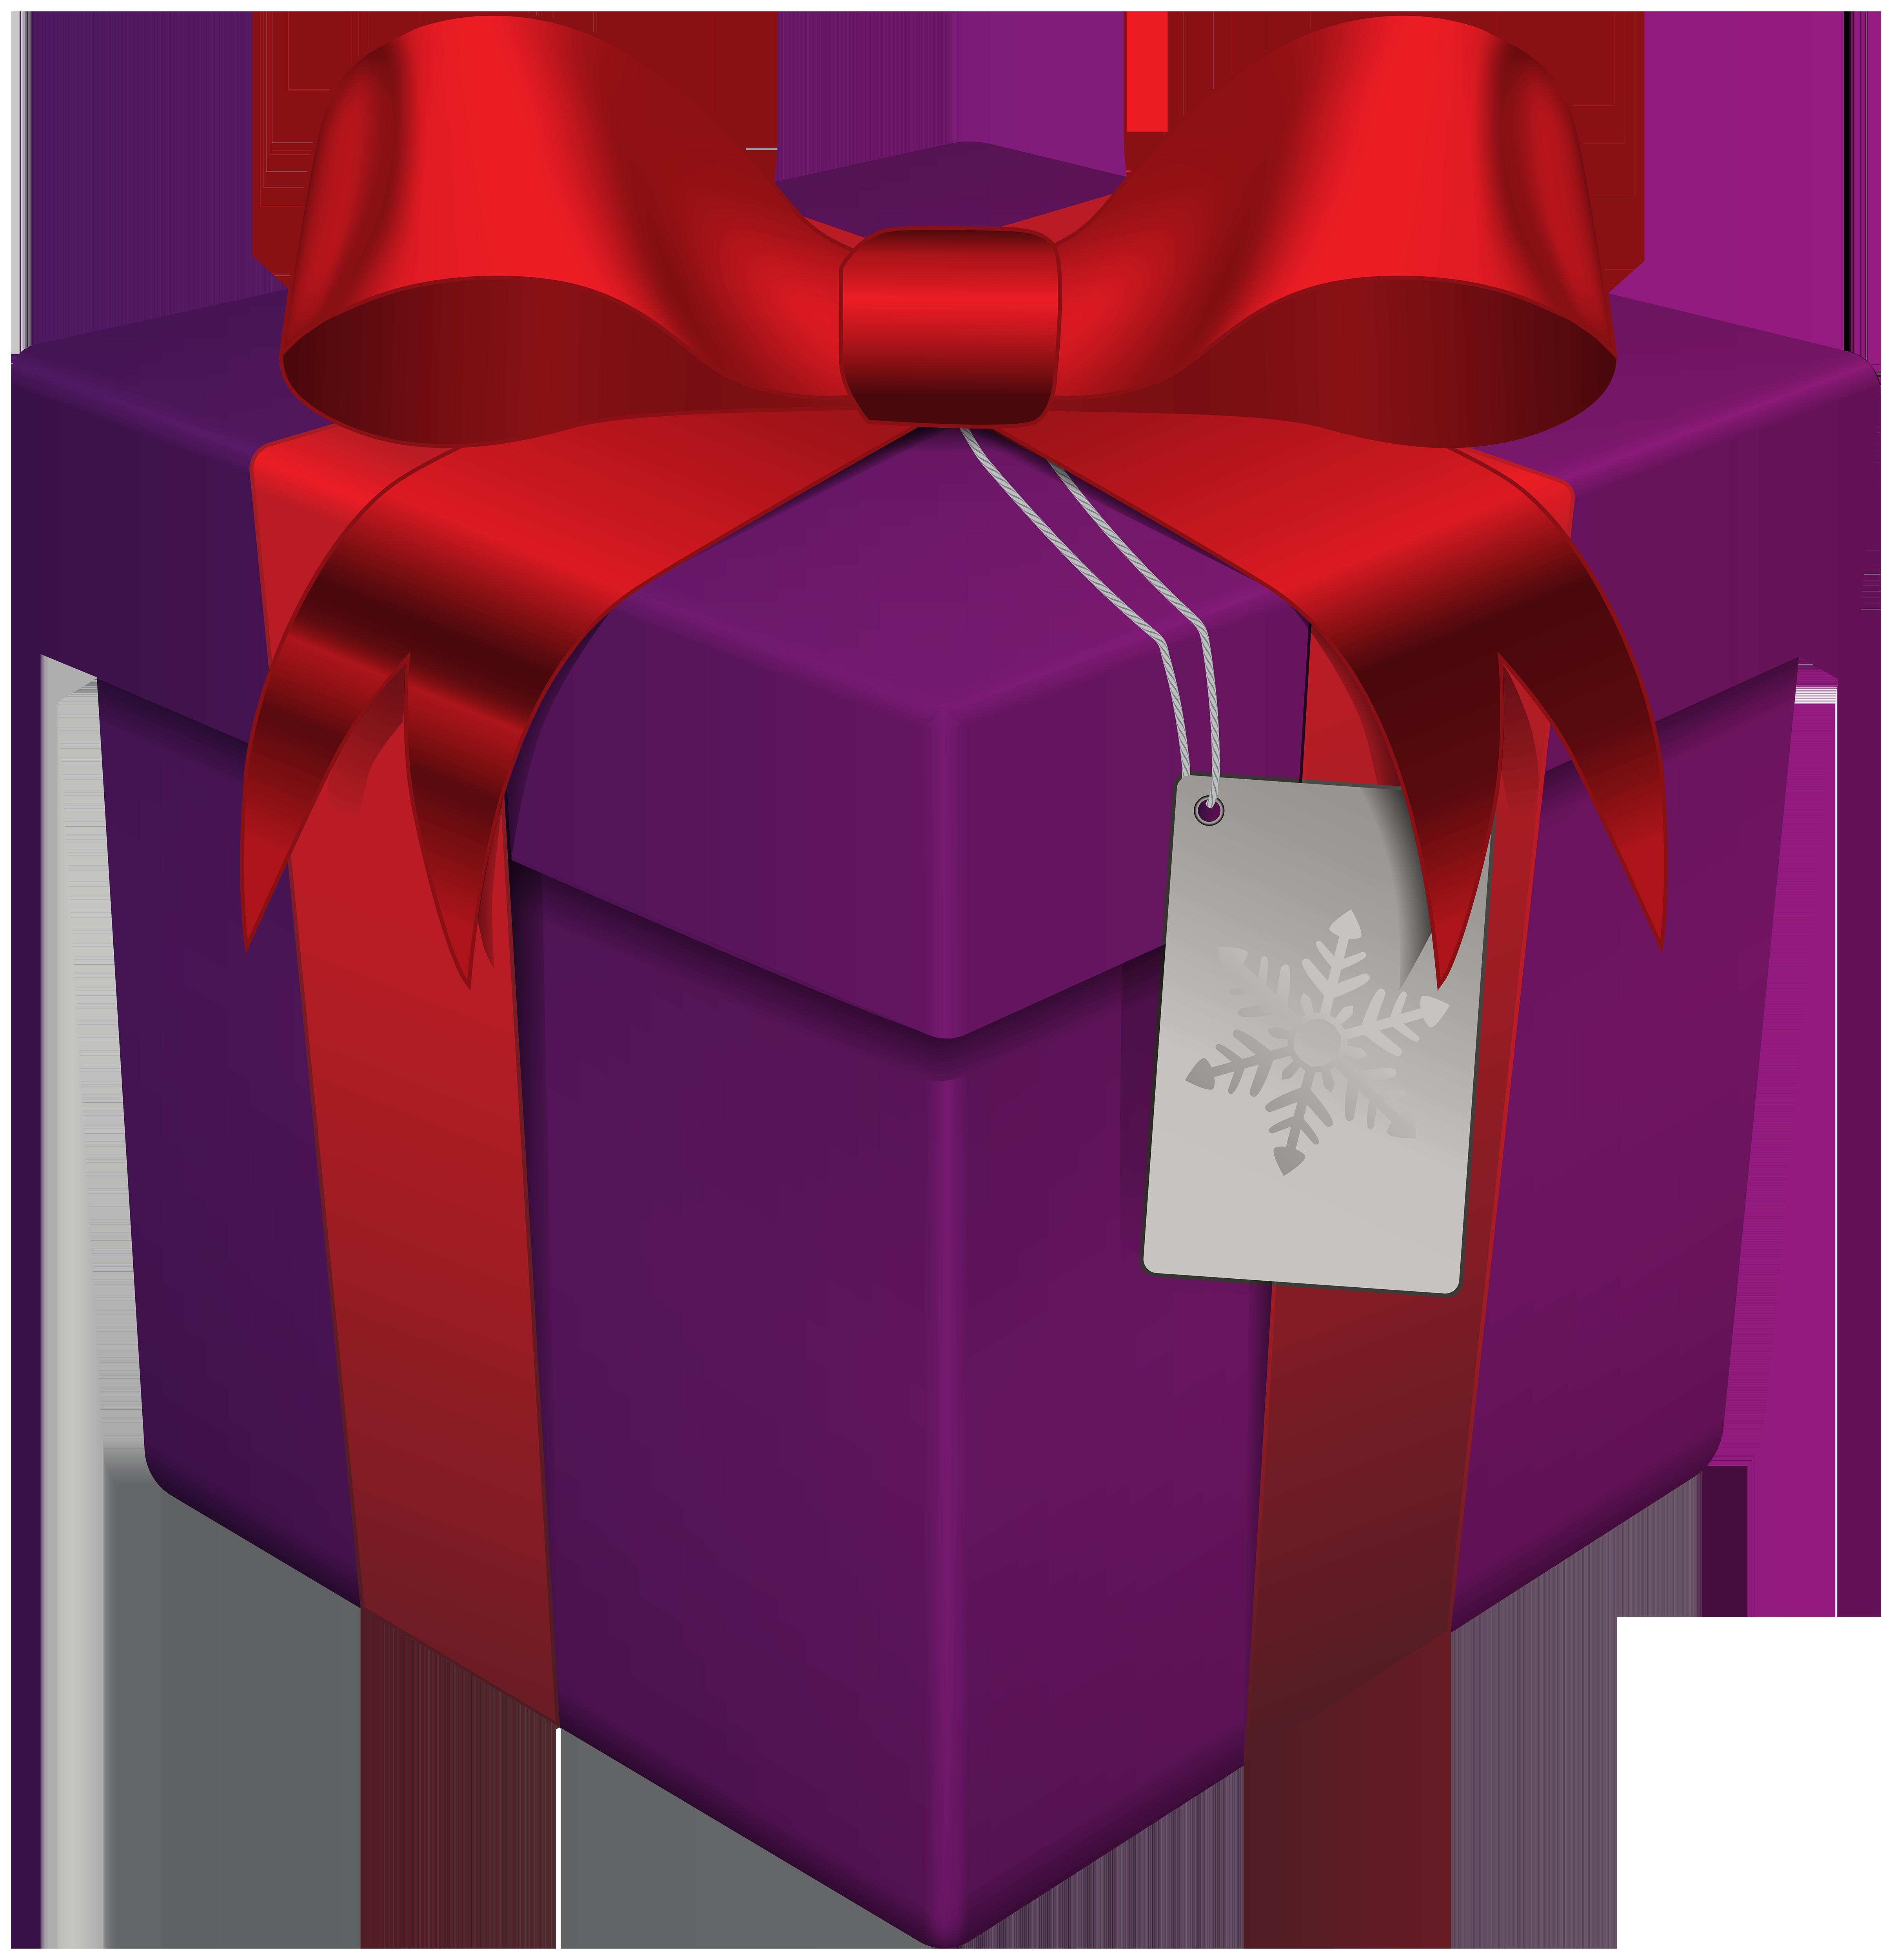 Christmas gift box transparent. Purple clipart present